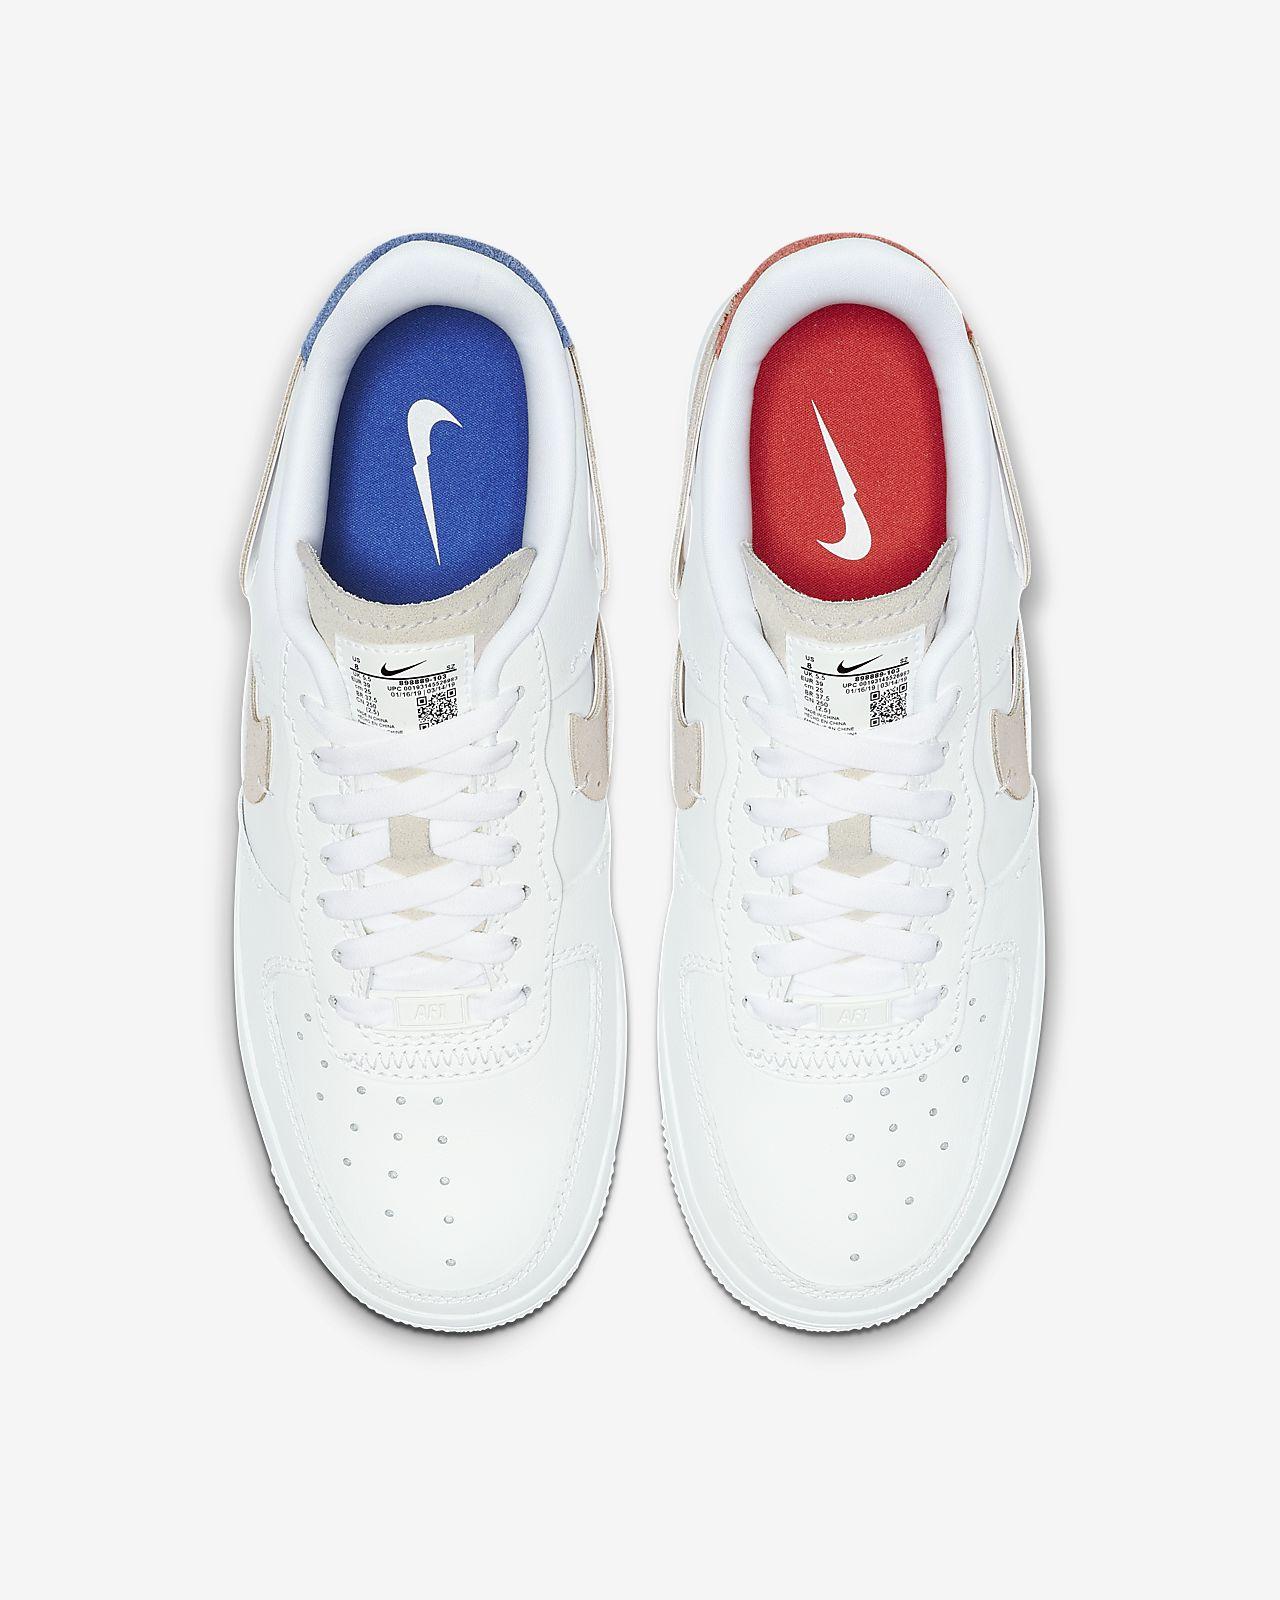 935c12ad8 Nike Air Force 1 '07 Lux Women's Shoe. Nike.com ZA